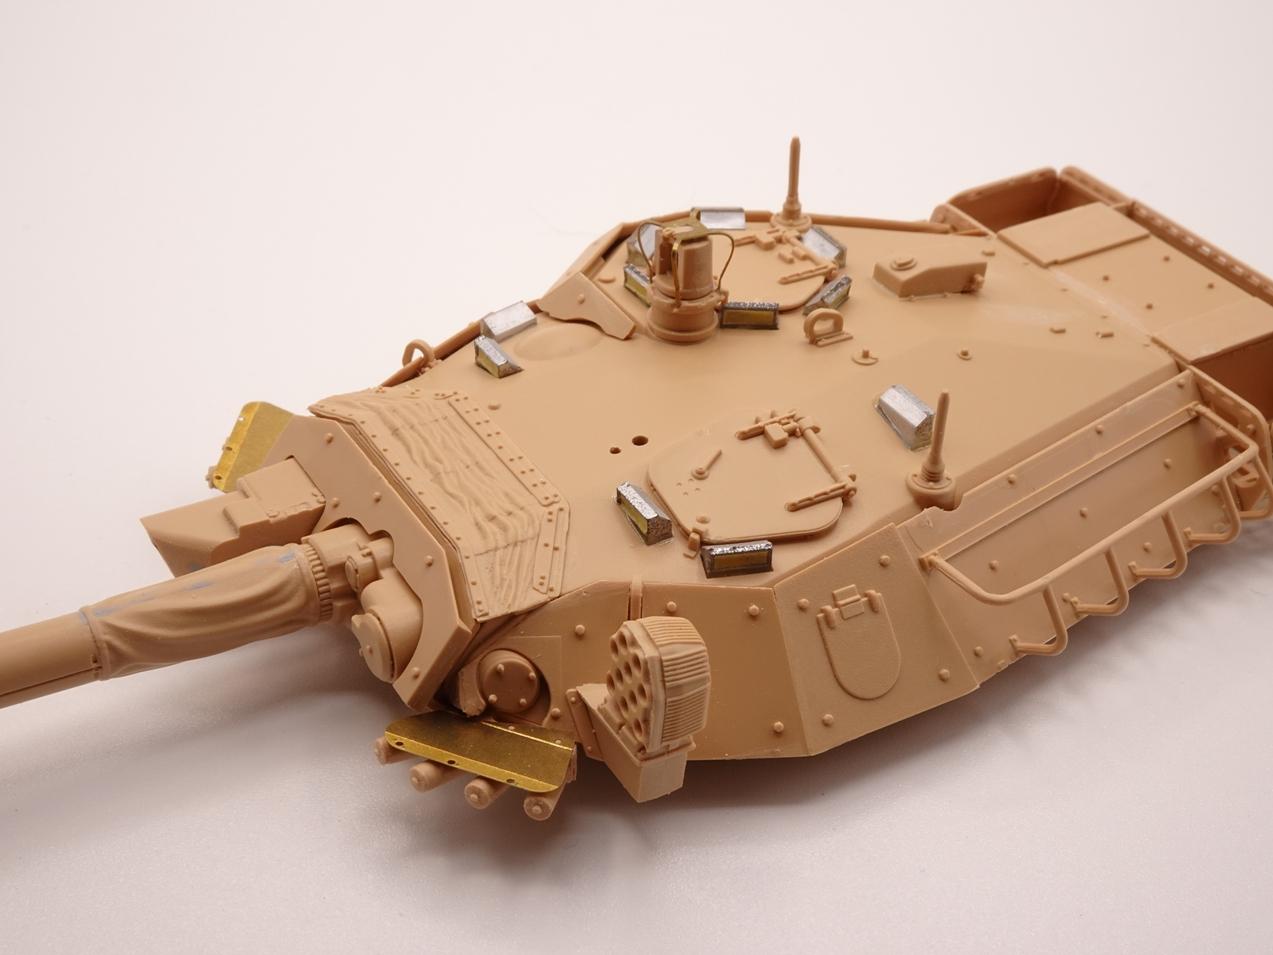 [Tiger Model] AMX-10RCR réf. 4602 - 1/35 - Page 2 Amx10-1907-6